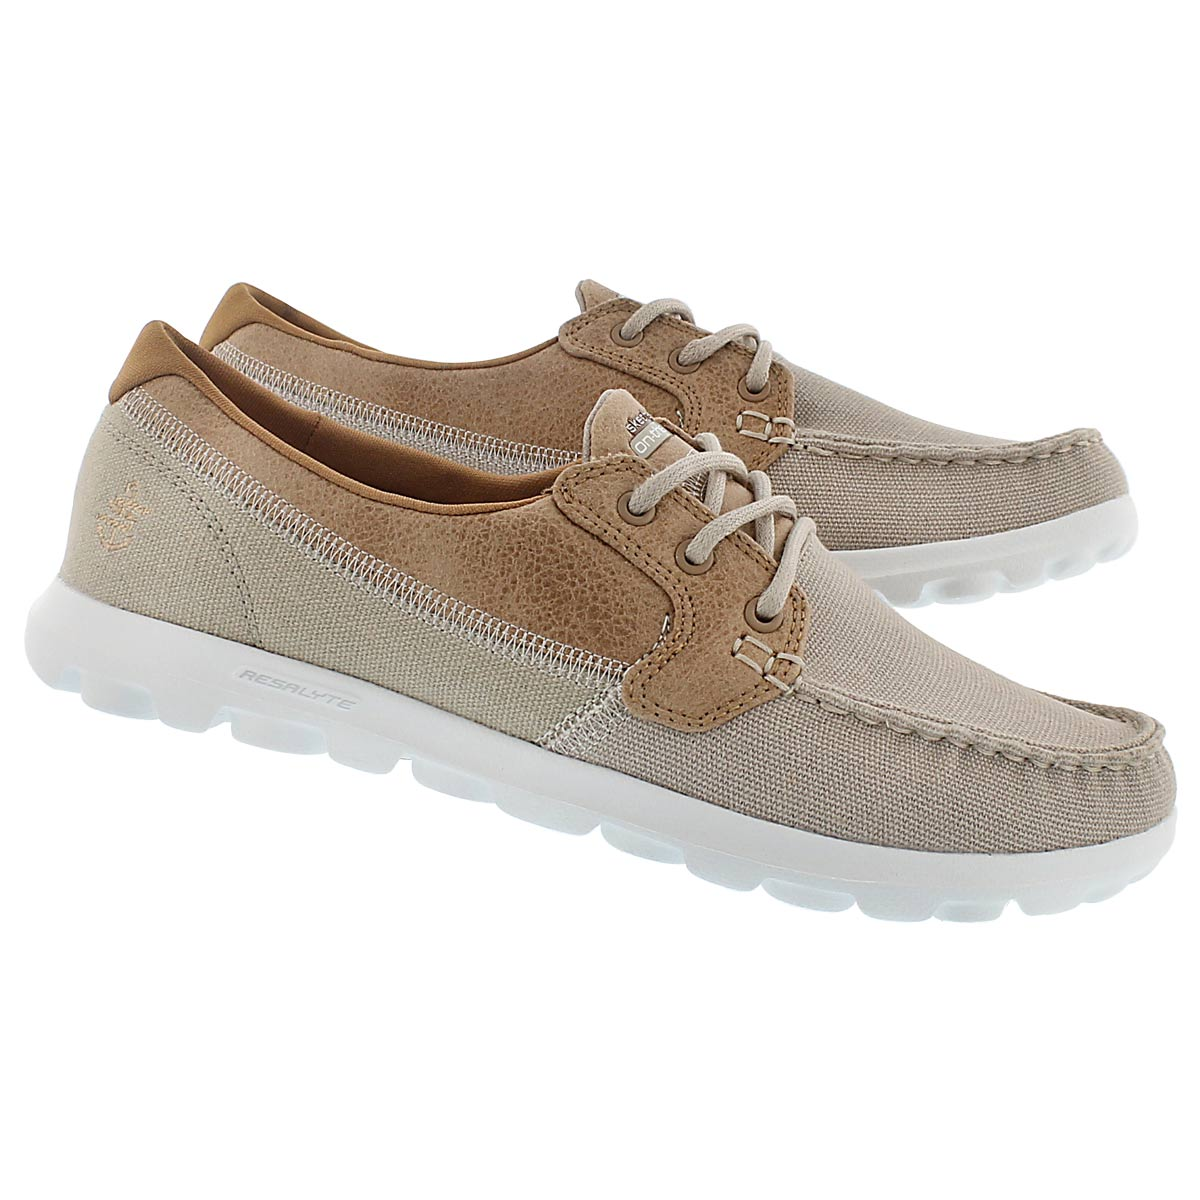 Lds Breezy natural 3 eye boat shoe